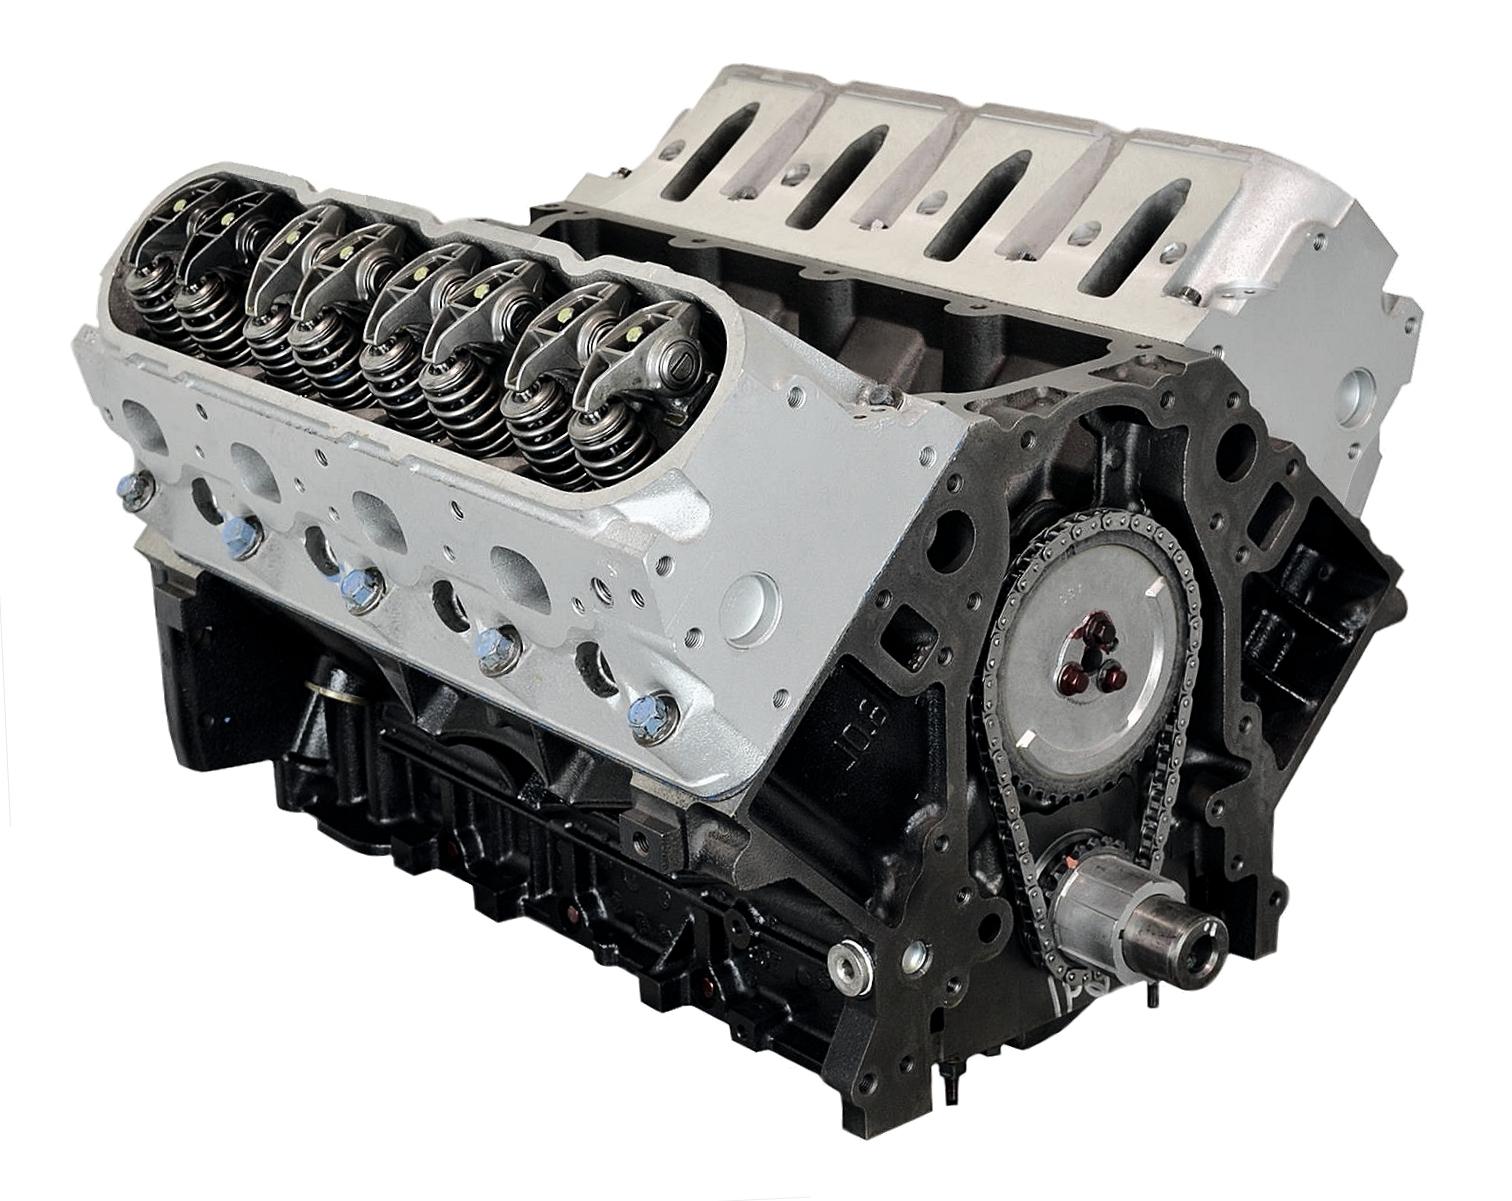 5.3 GM L59 Reman Long Block Engine Chevrolet Express 2500 Vin Code: T